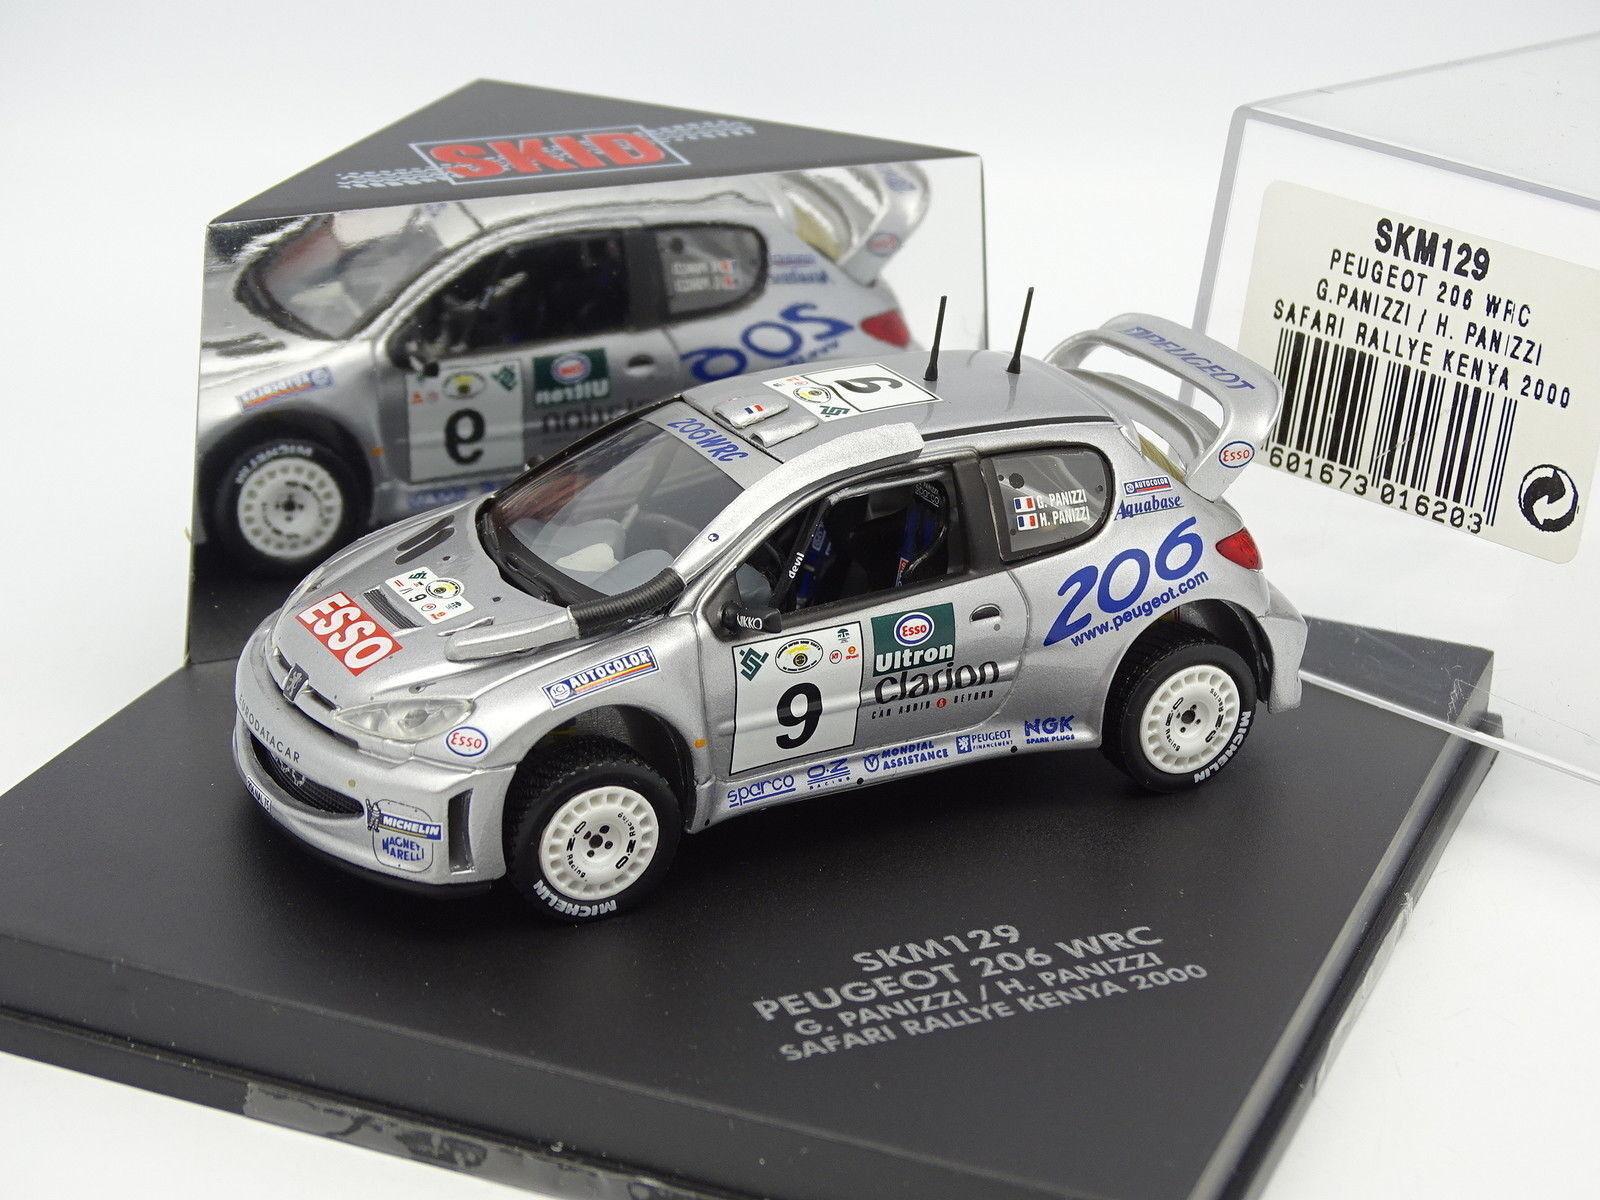 Skid Vitesse 1 43 - Peugeot 206 206 206 WRC Rallye Safari Kenya 2000 52a2cc